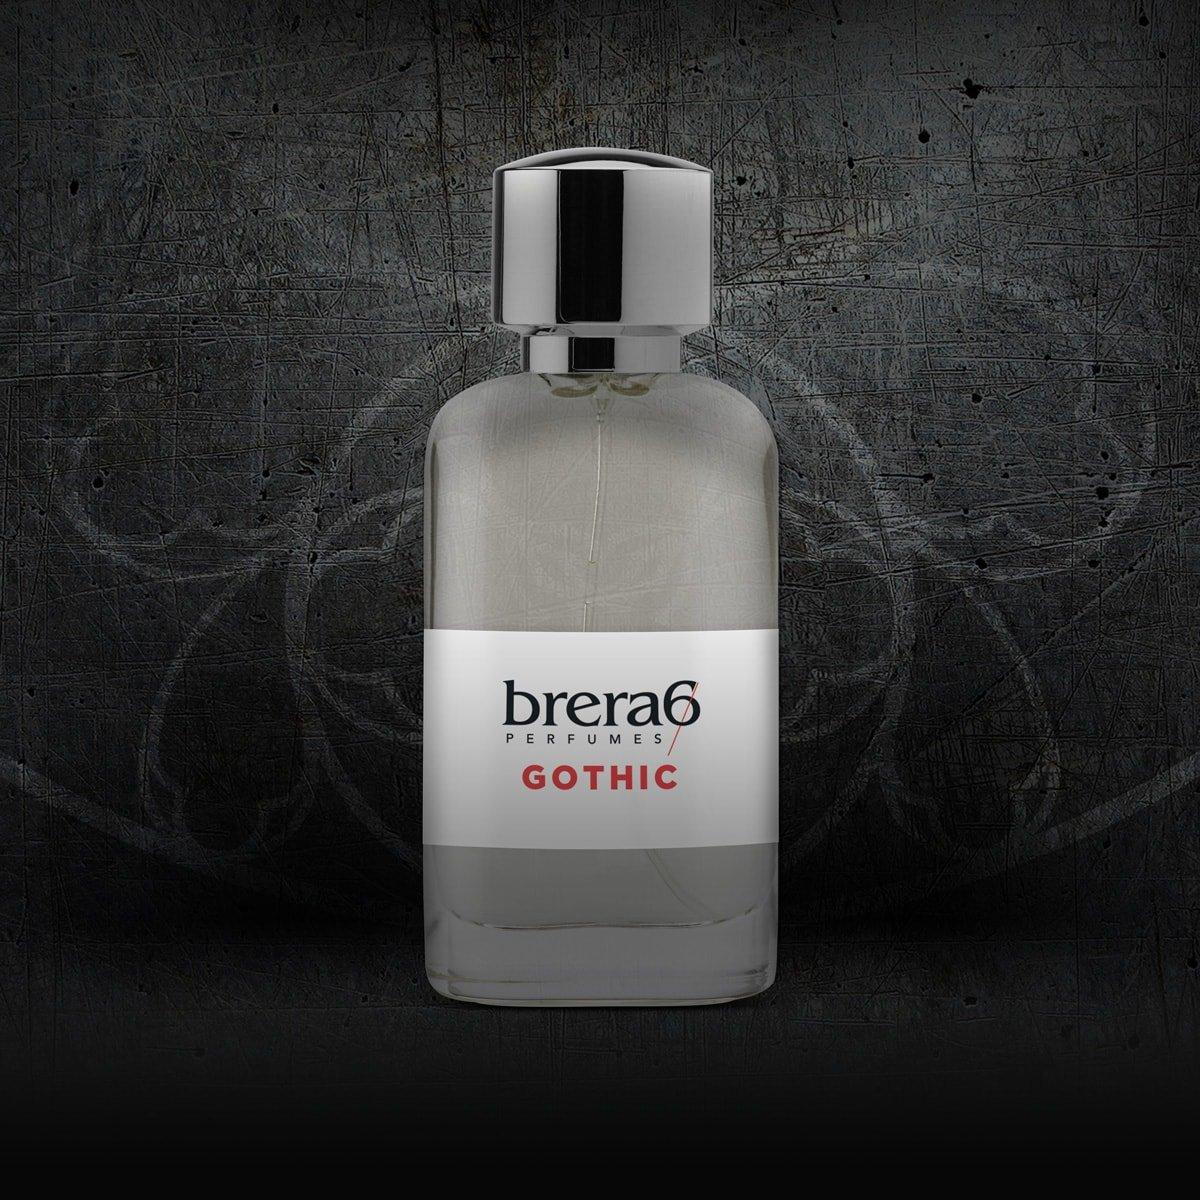 brera6 perfumes - GOTHIC